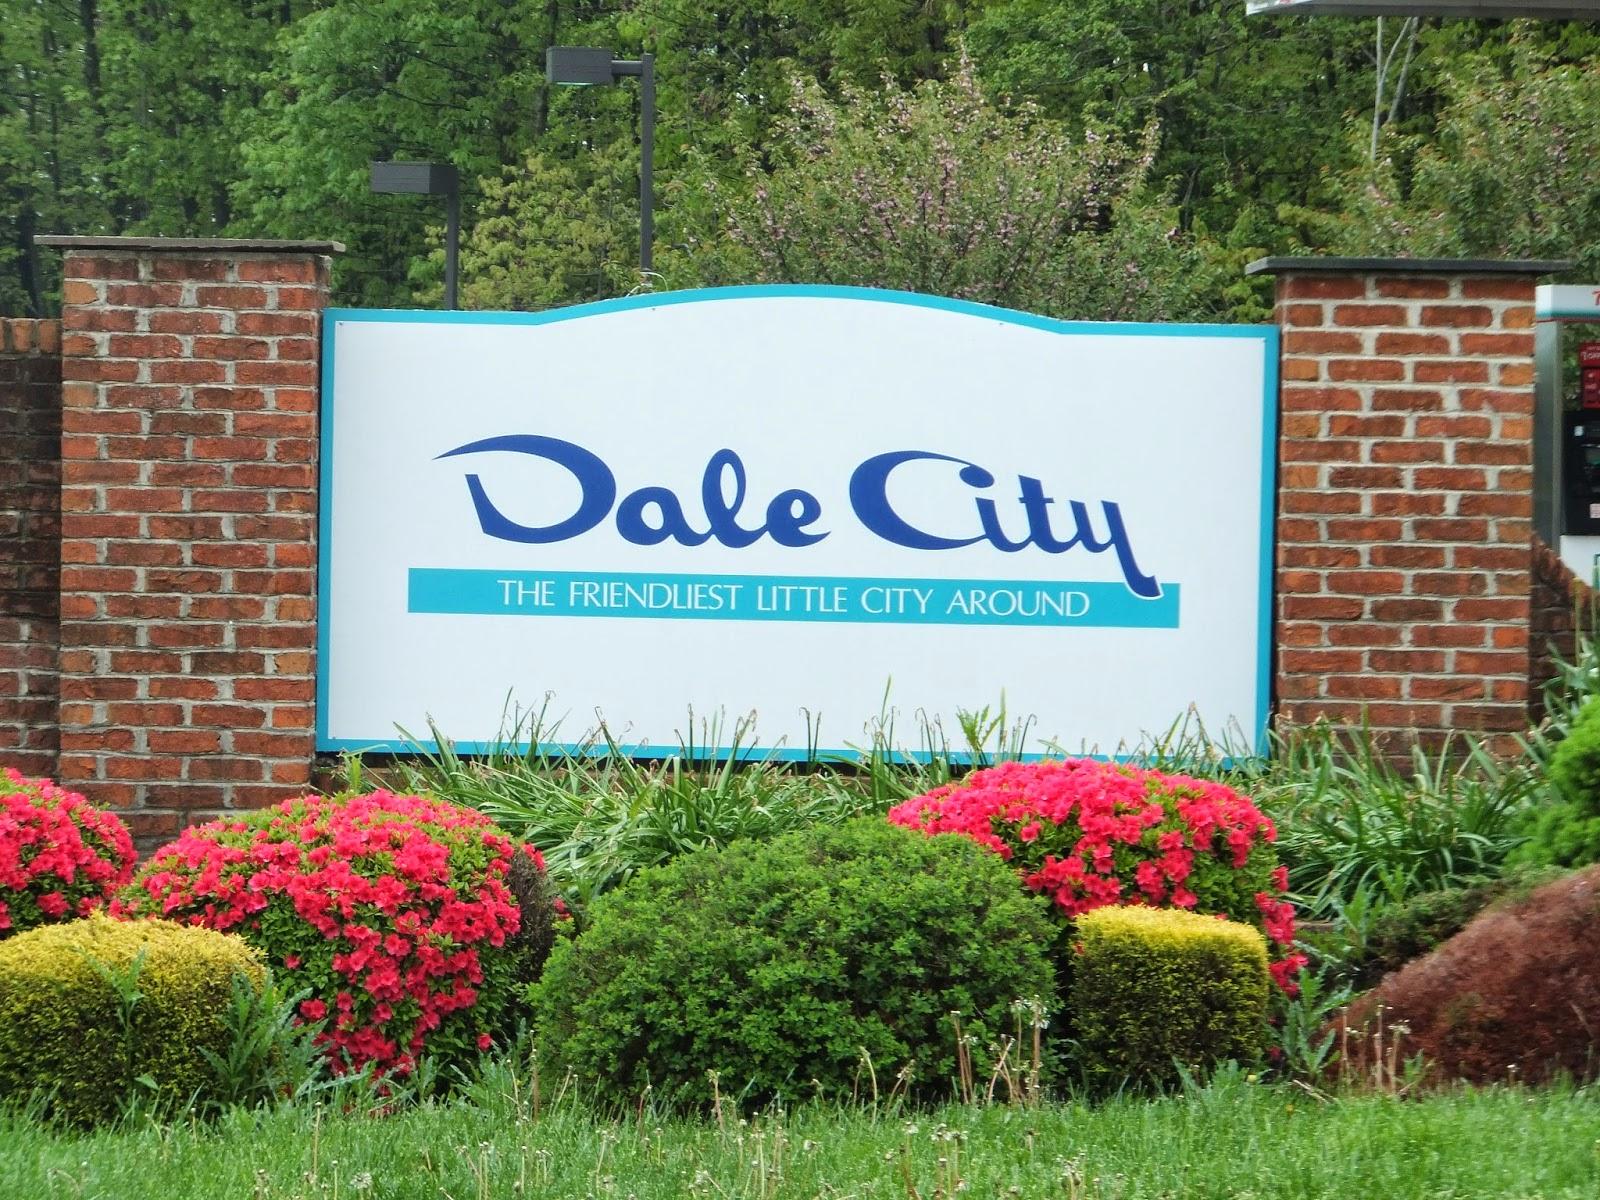 Dale City Woodbridge Va Homes For Sale With No Hoa